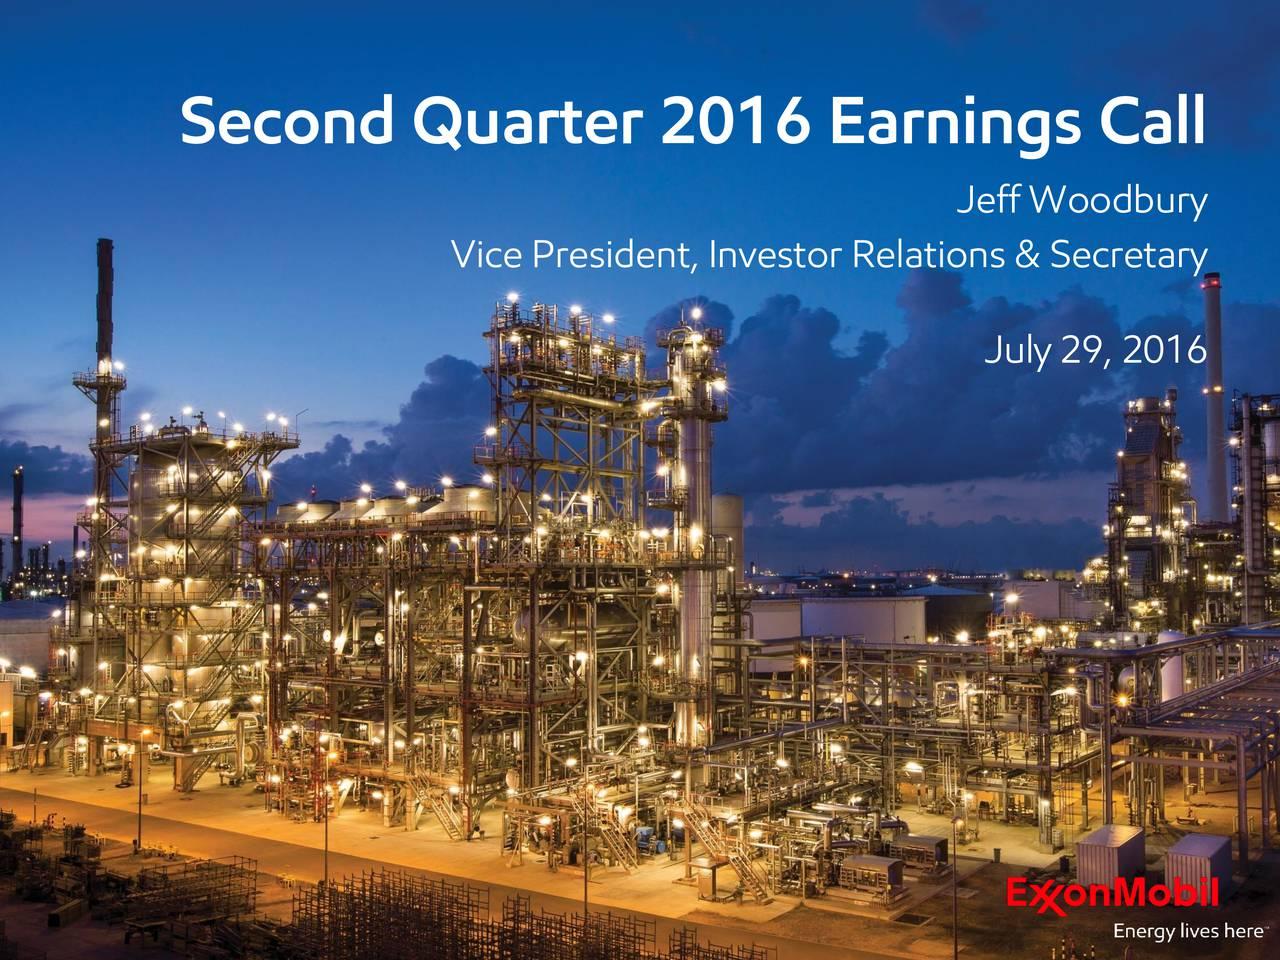 Jeff Woodbury Vice President, Investor Relations & Secretary July 29, 2016